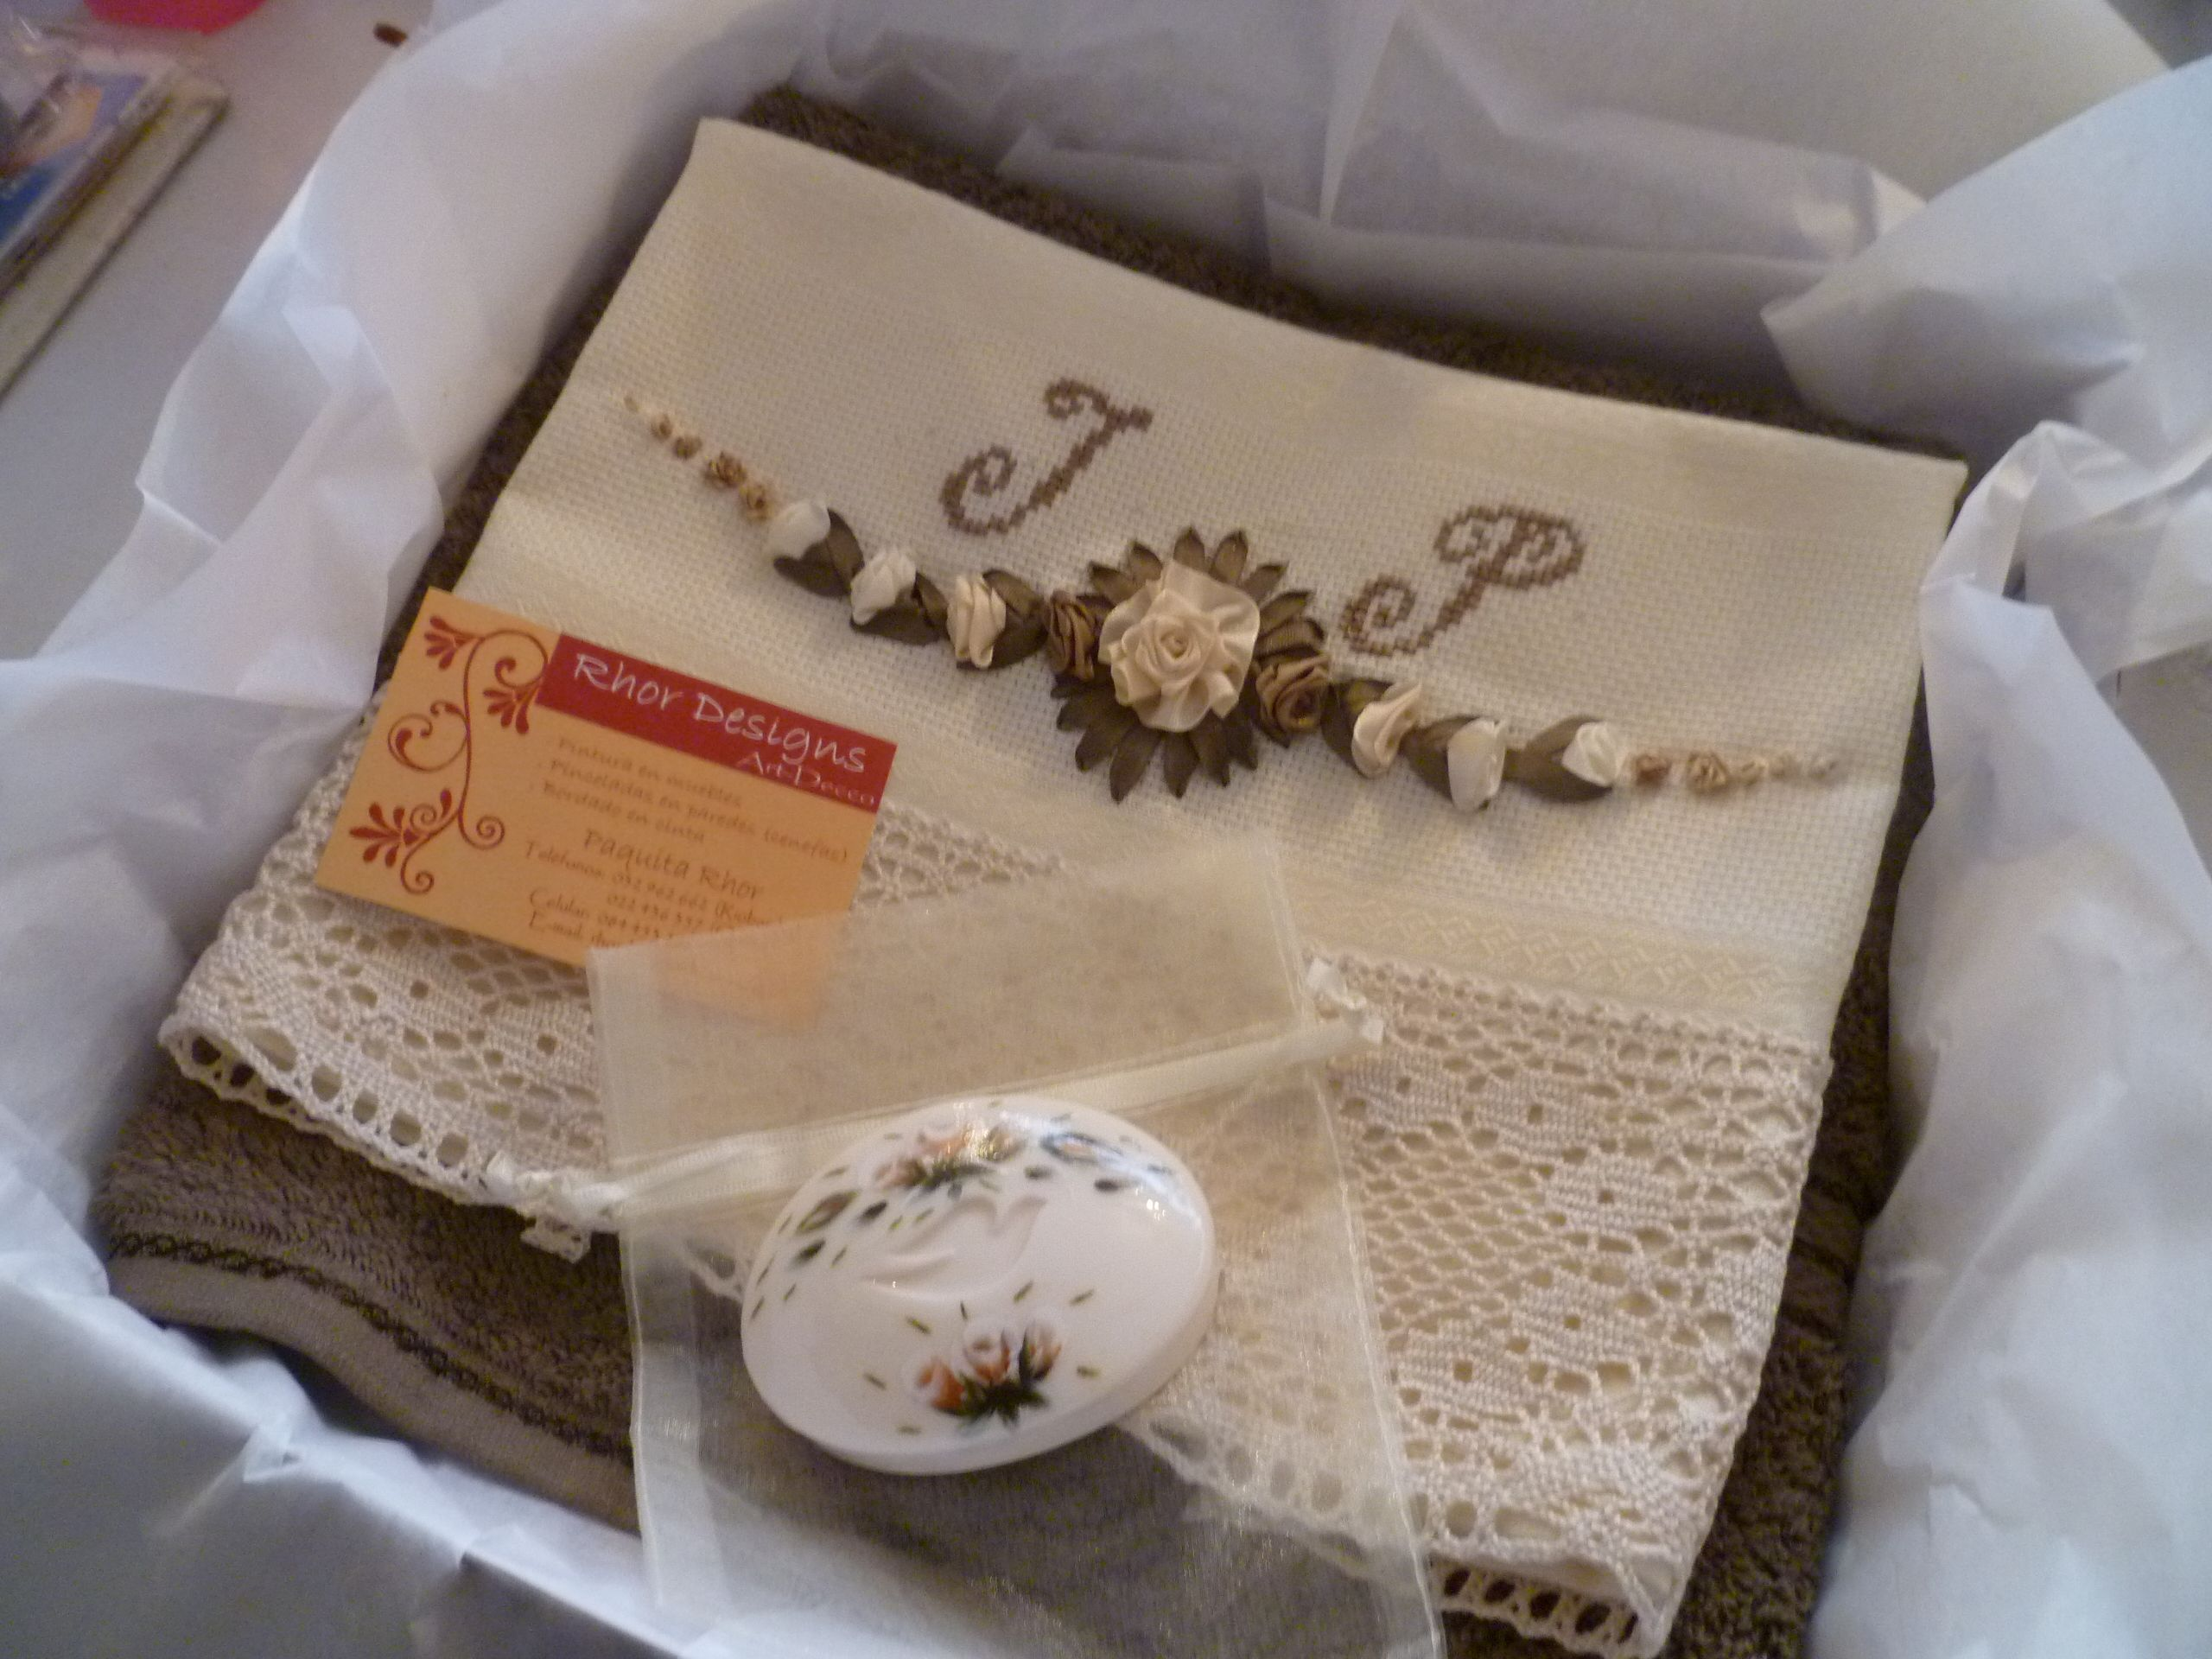 Servilletas para bautizo punto orillas a crochet rosas new style for 2016 2017 servilletas - Servilletas personalizadas ...